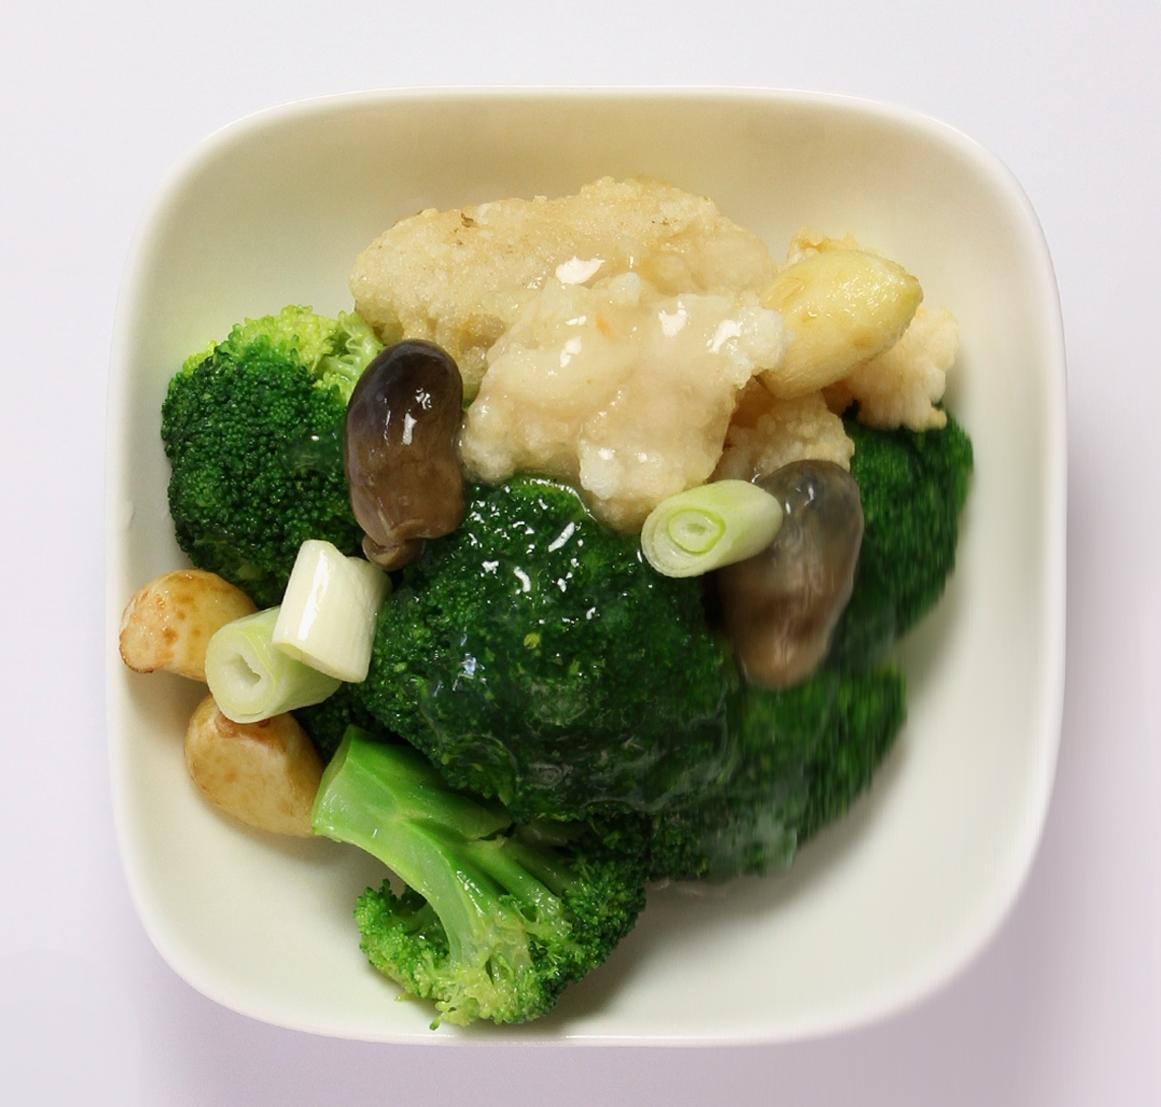 Broccoli Flower with Garlic